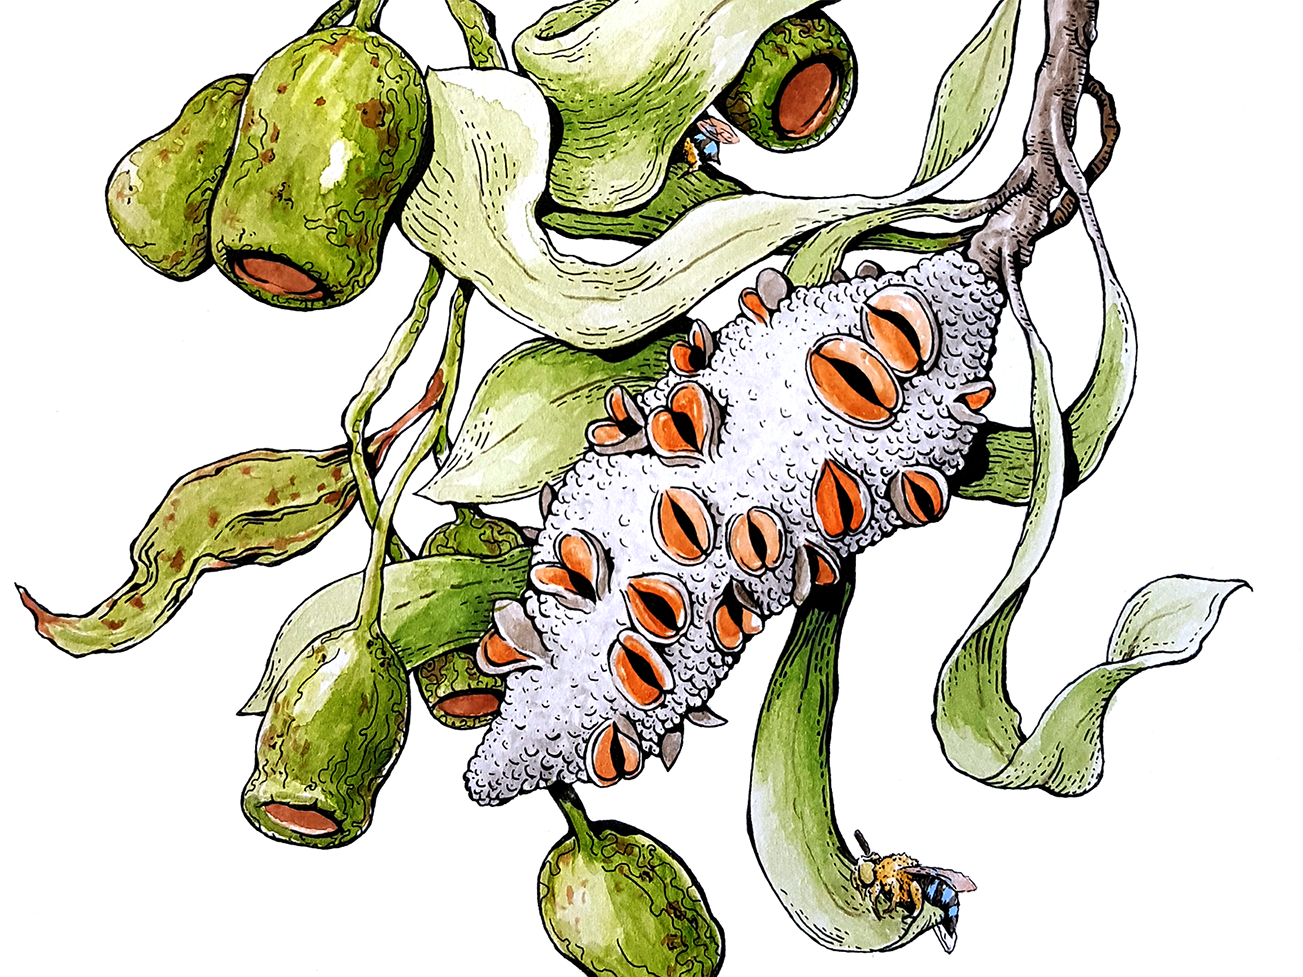 Blue Banded Bee Band natural plants leaves banksia story telling editorial illustration book illustration blue banded bee bee botanical illustration botanical artist nature gouache artwork watercolor australia drawing illustrator illustration